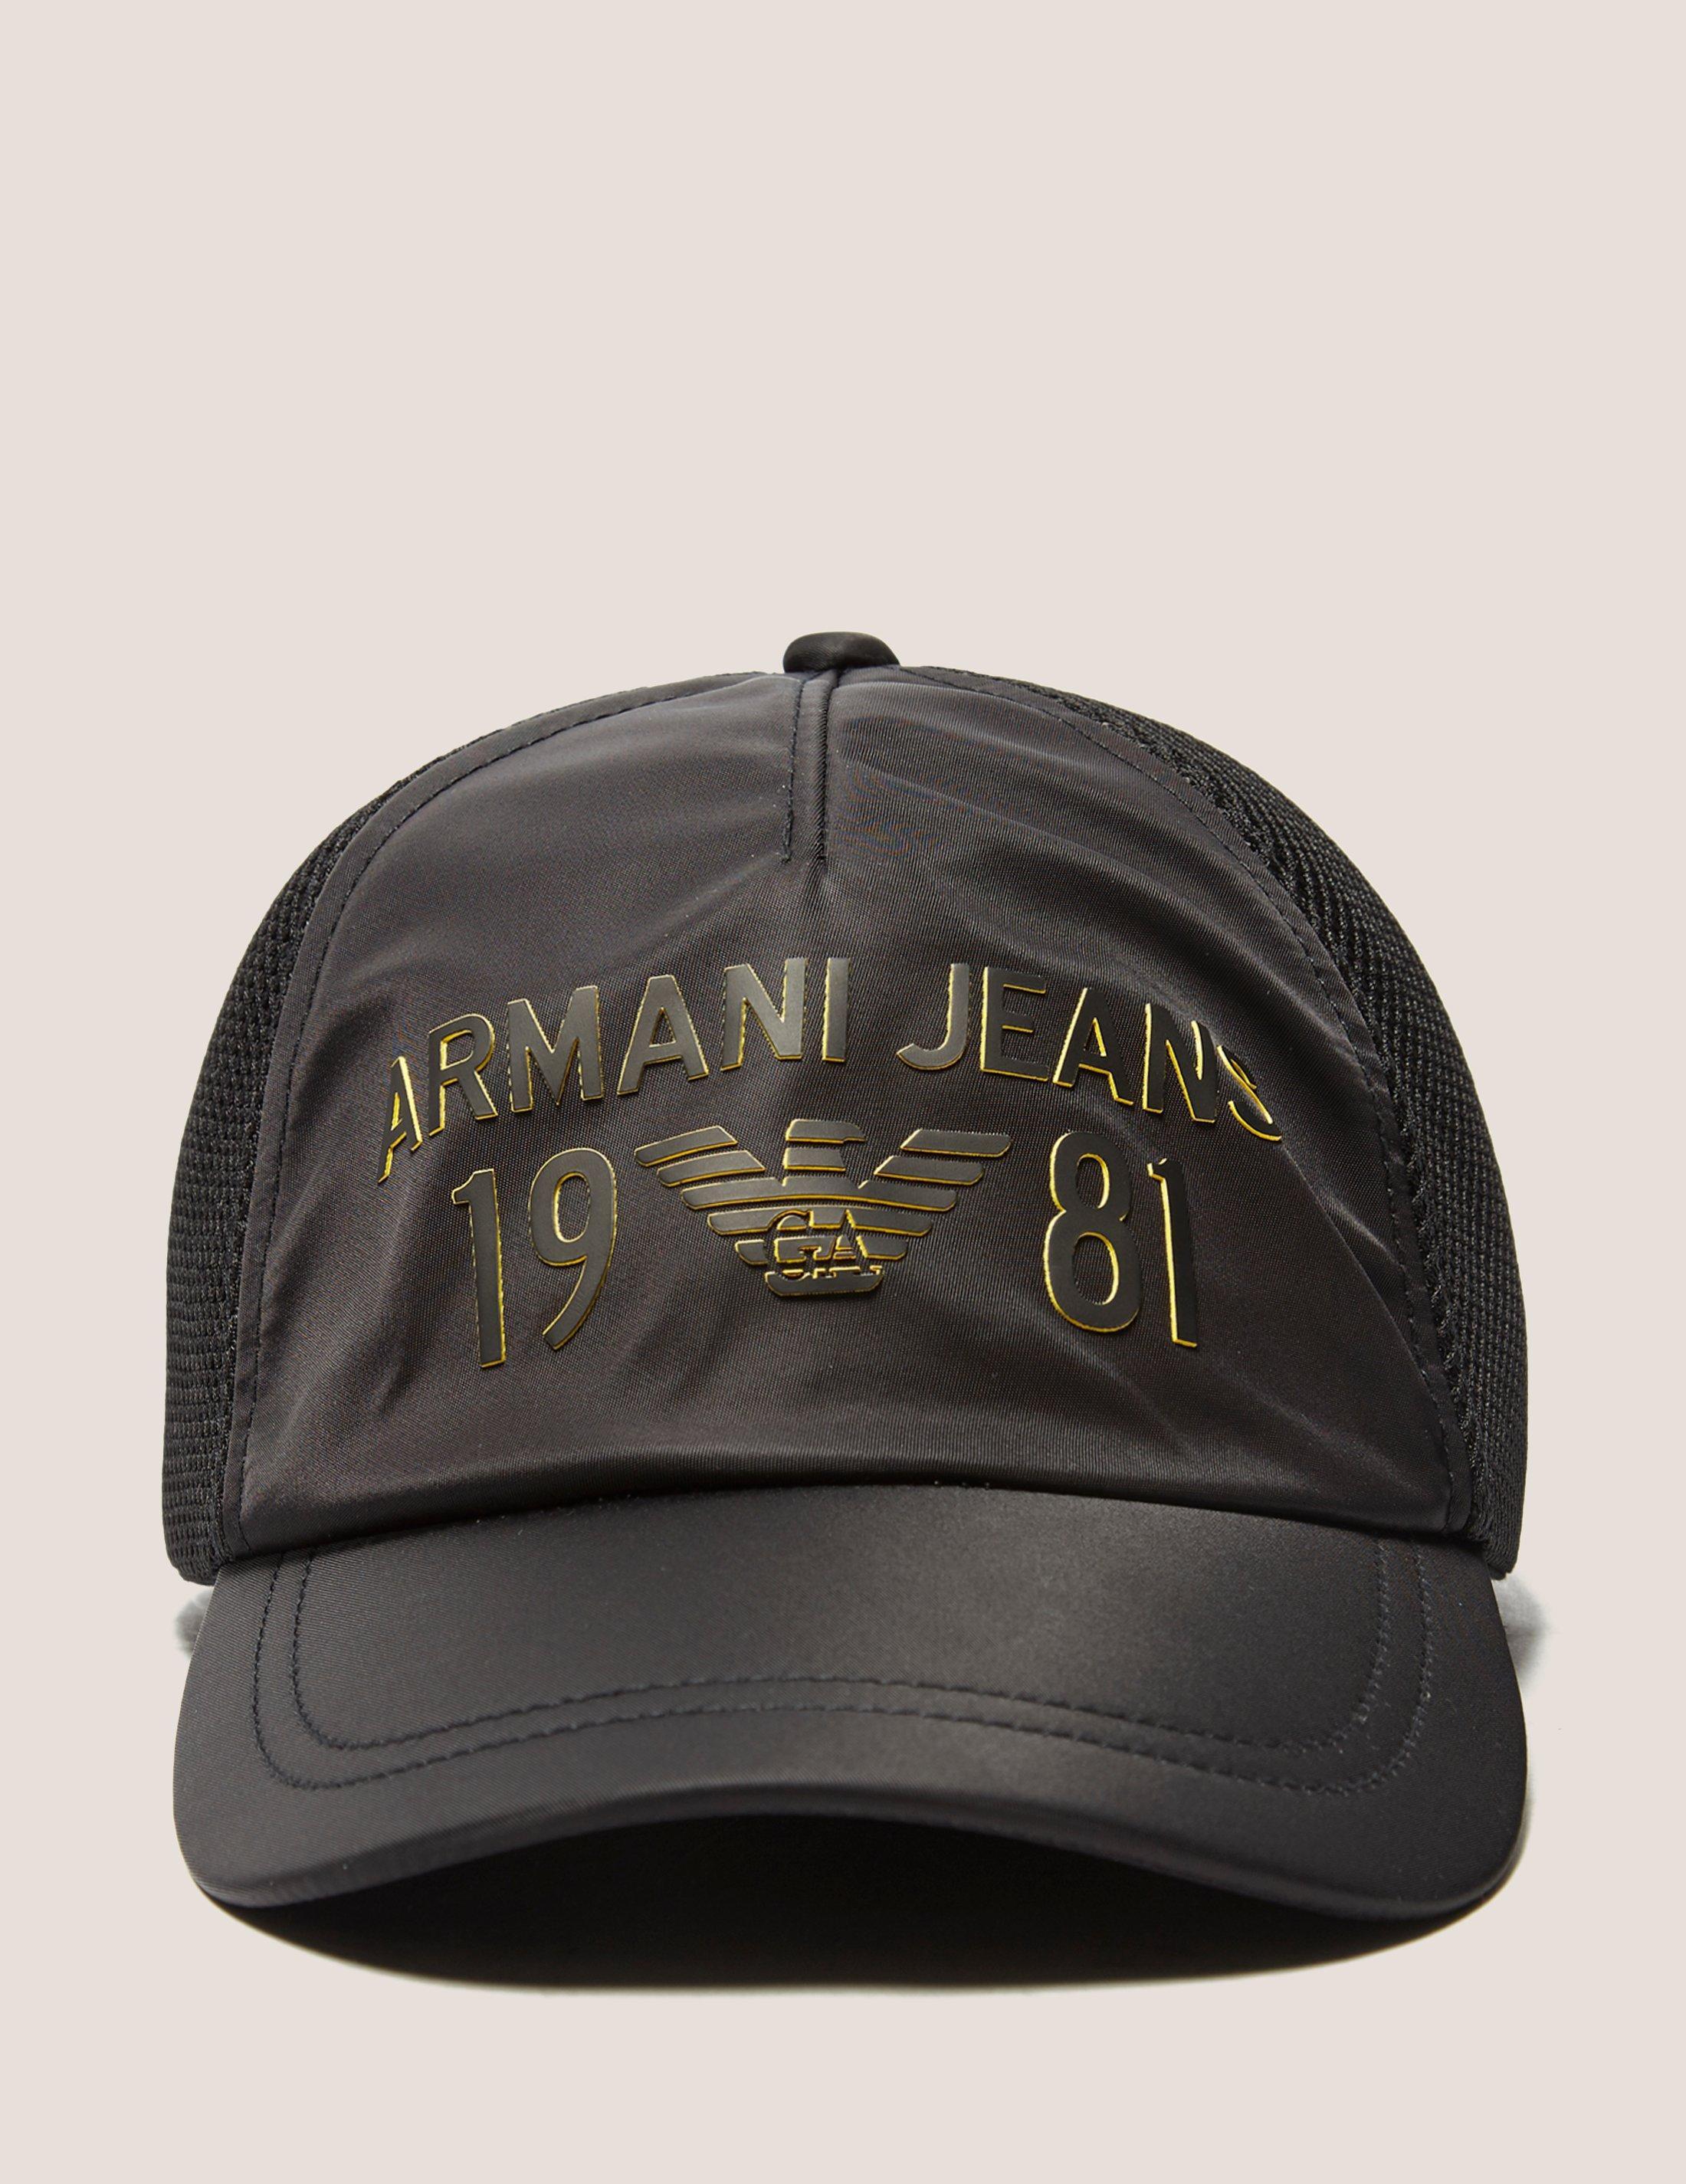 3930aaed75c Lyst - Armani Jeans Mens Large Logo Baseball Cap Black in Black for Men